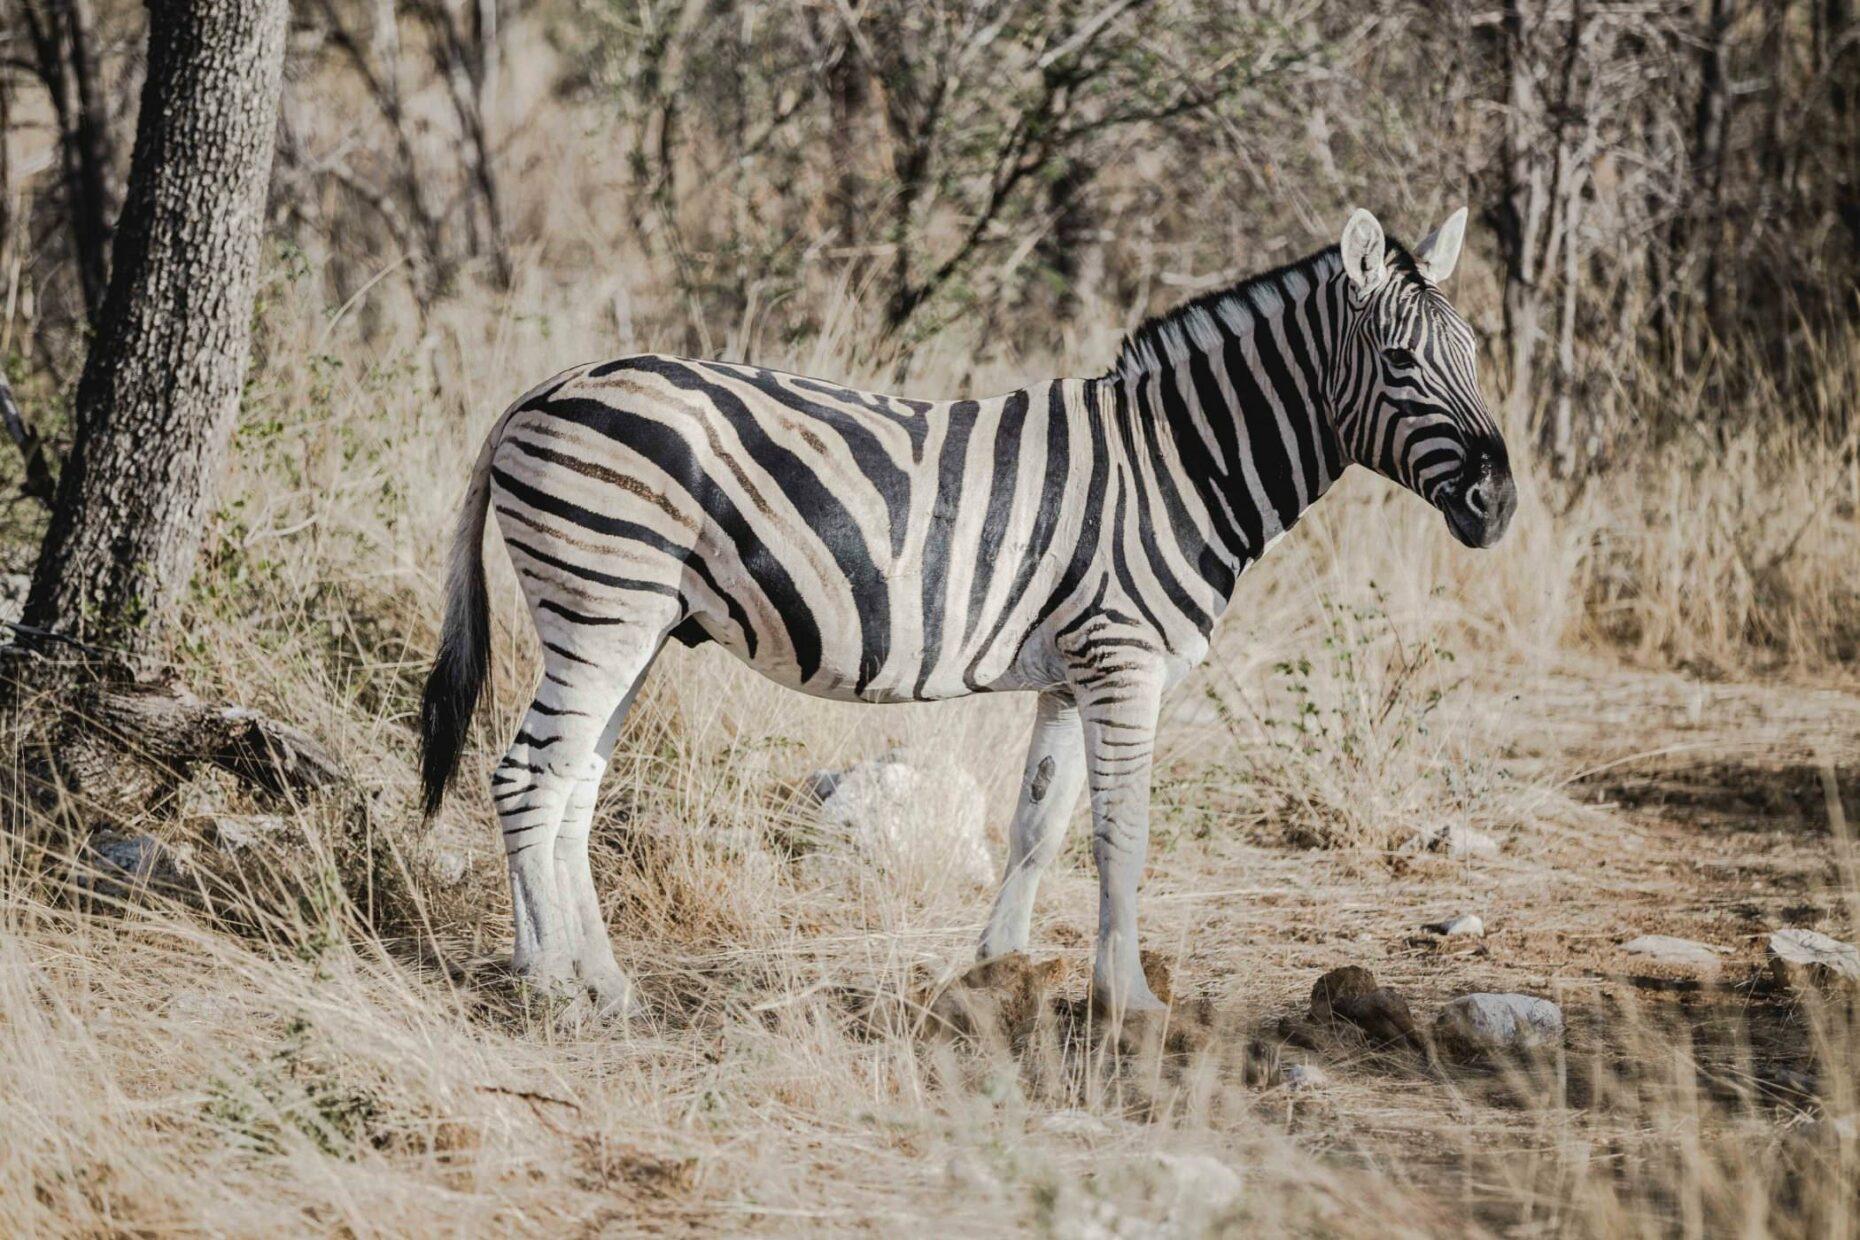 zebra-in-namibia-savannah